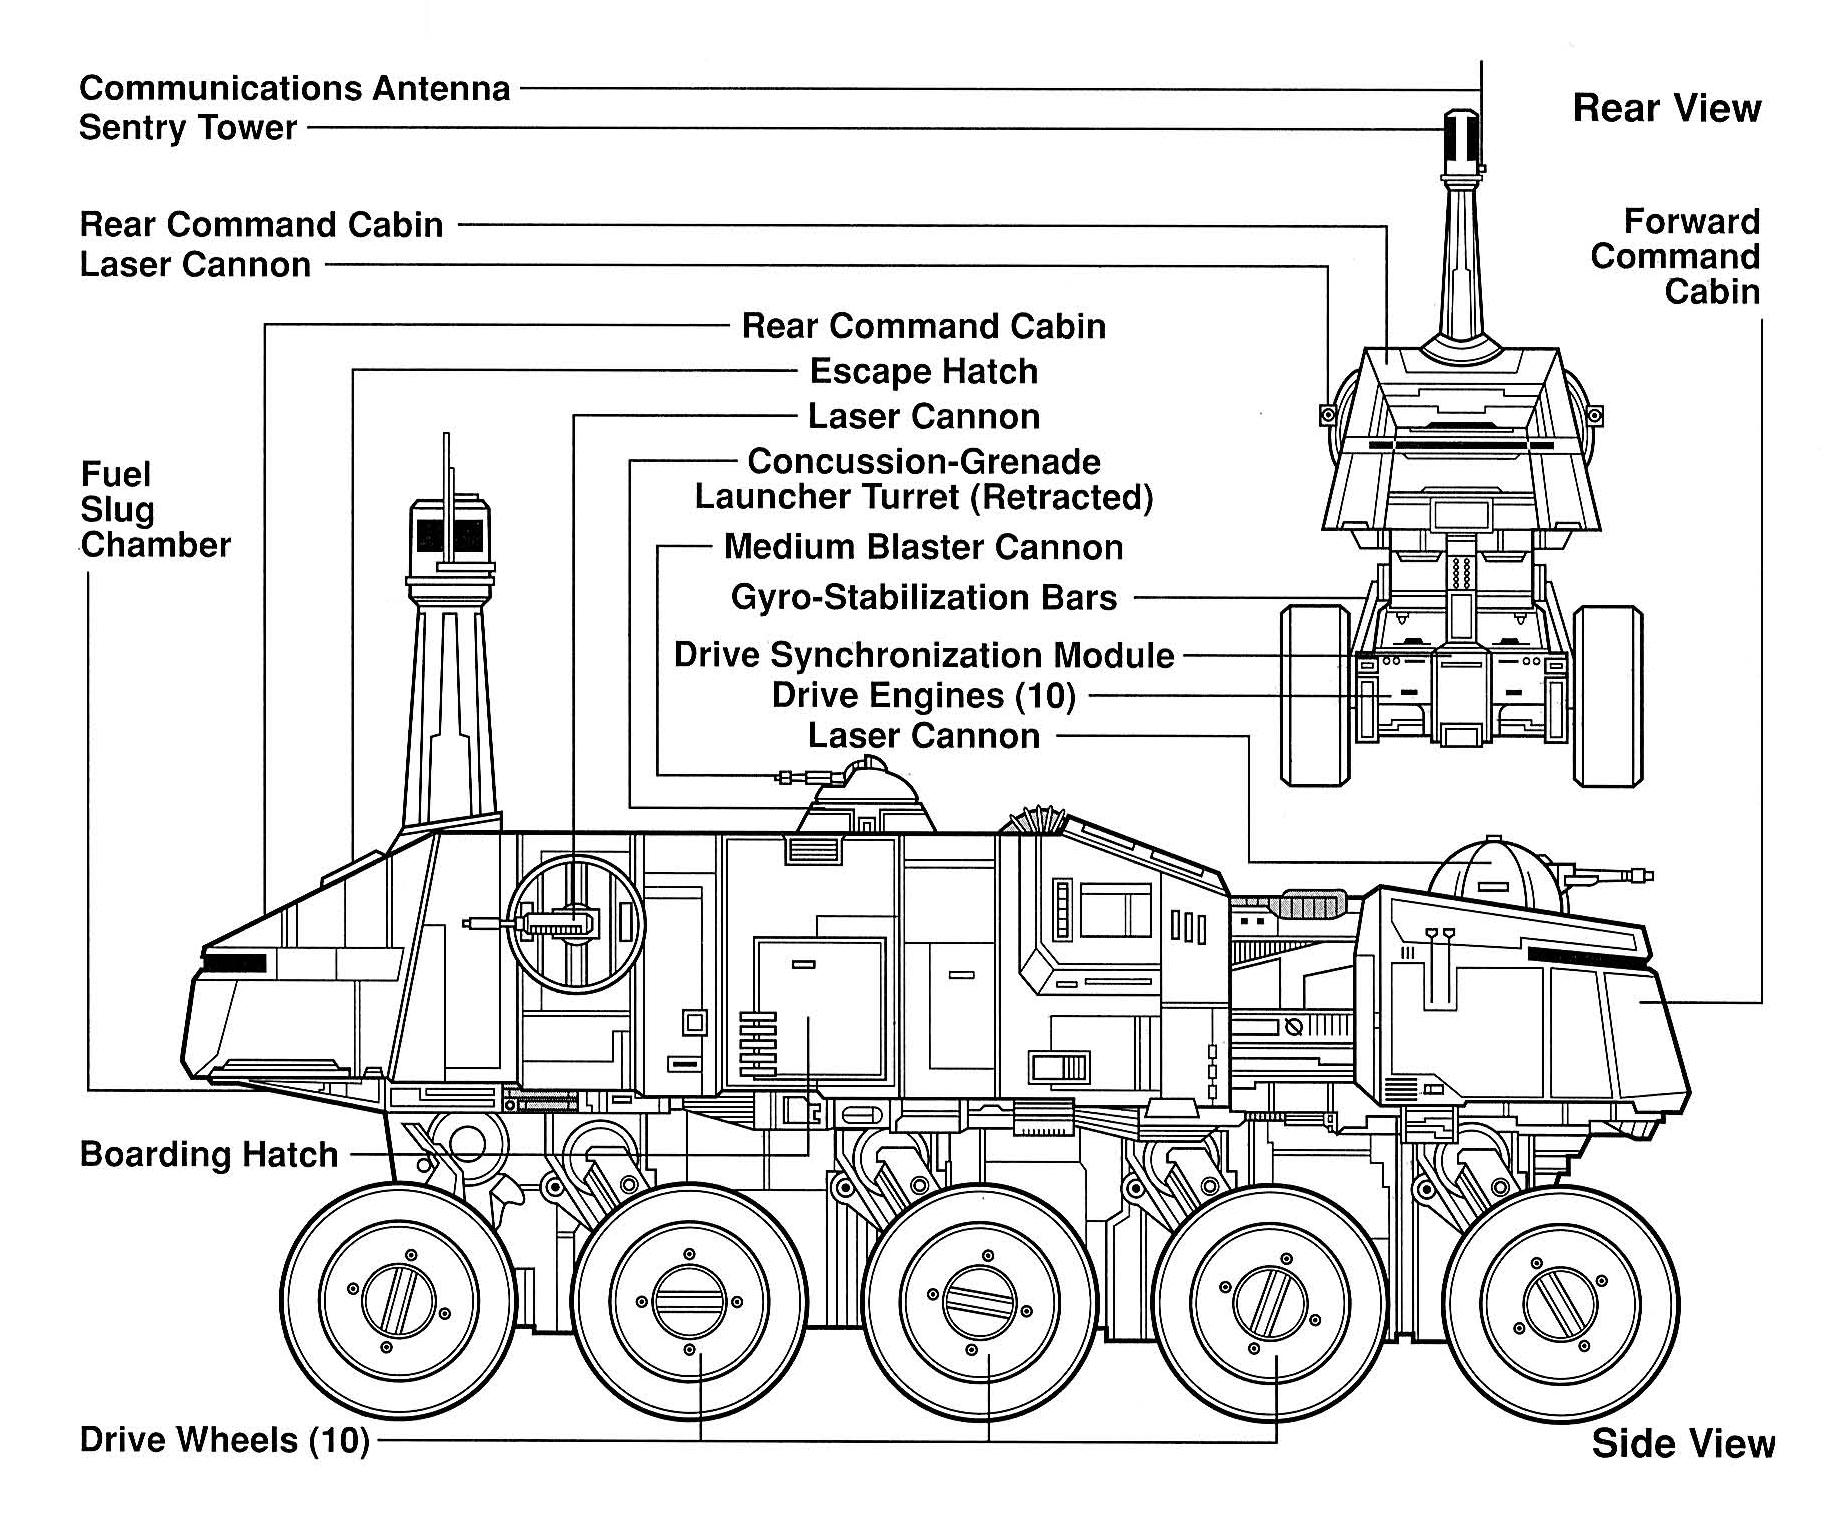 Anatomy of a Juggernaut image - -Clone Wars Multi-Media Project Fans ...